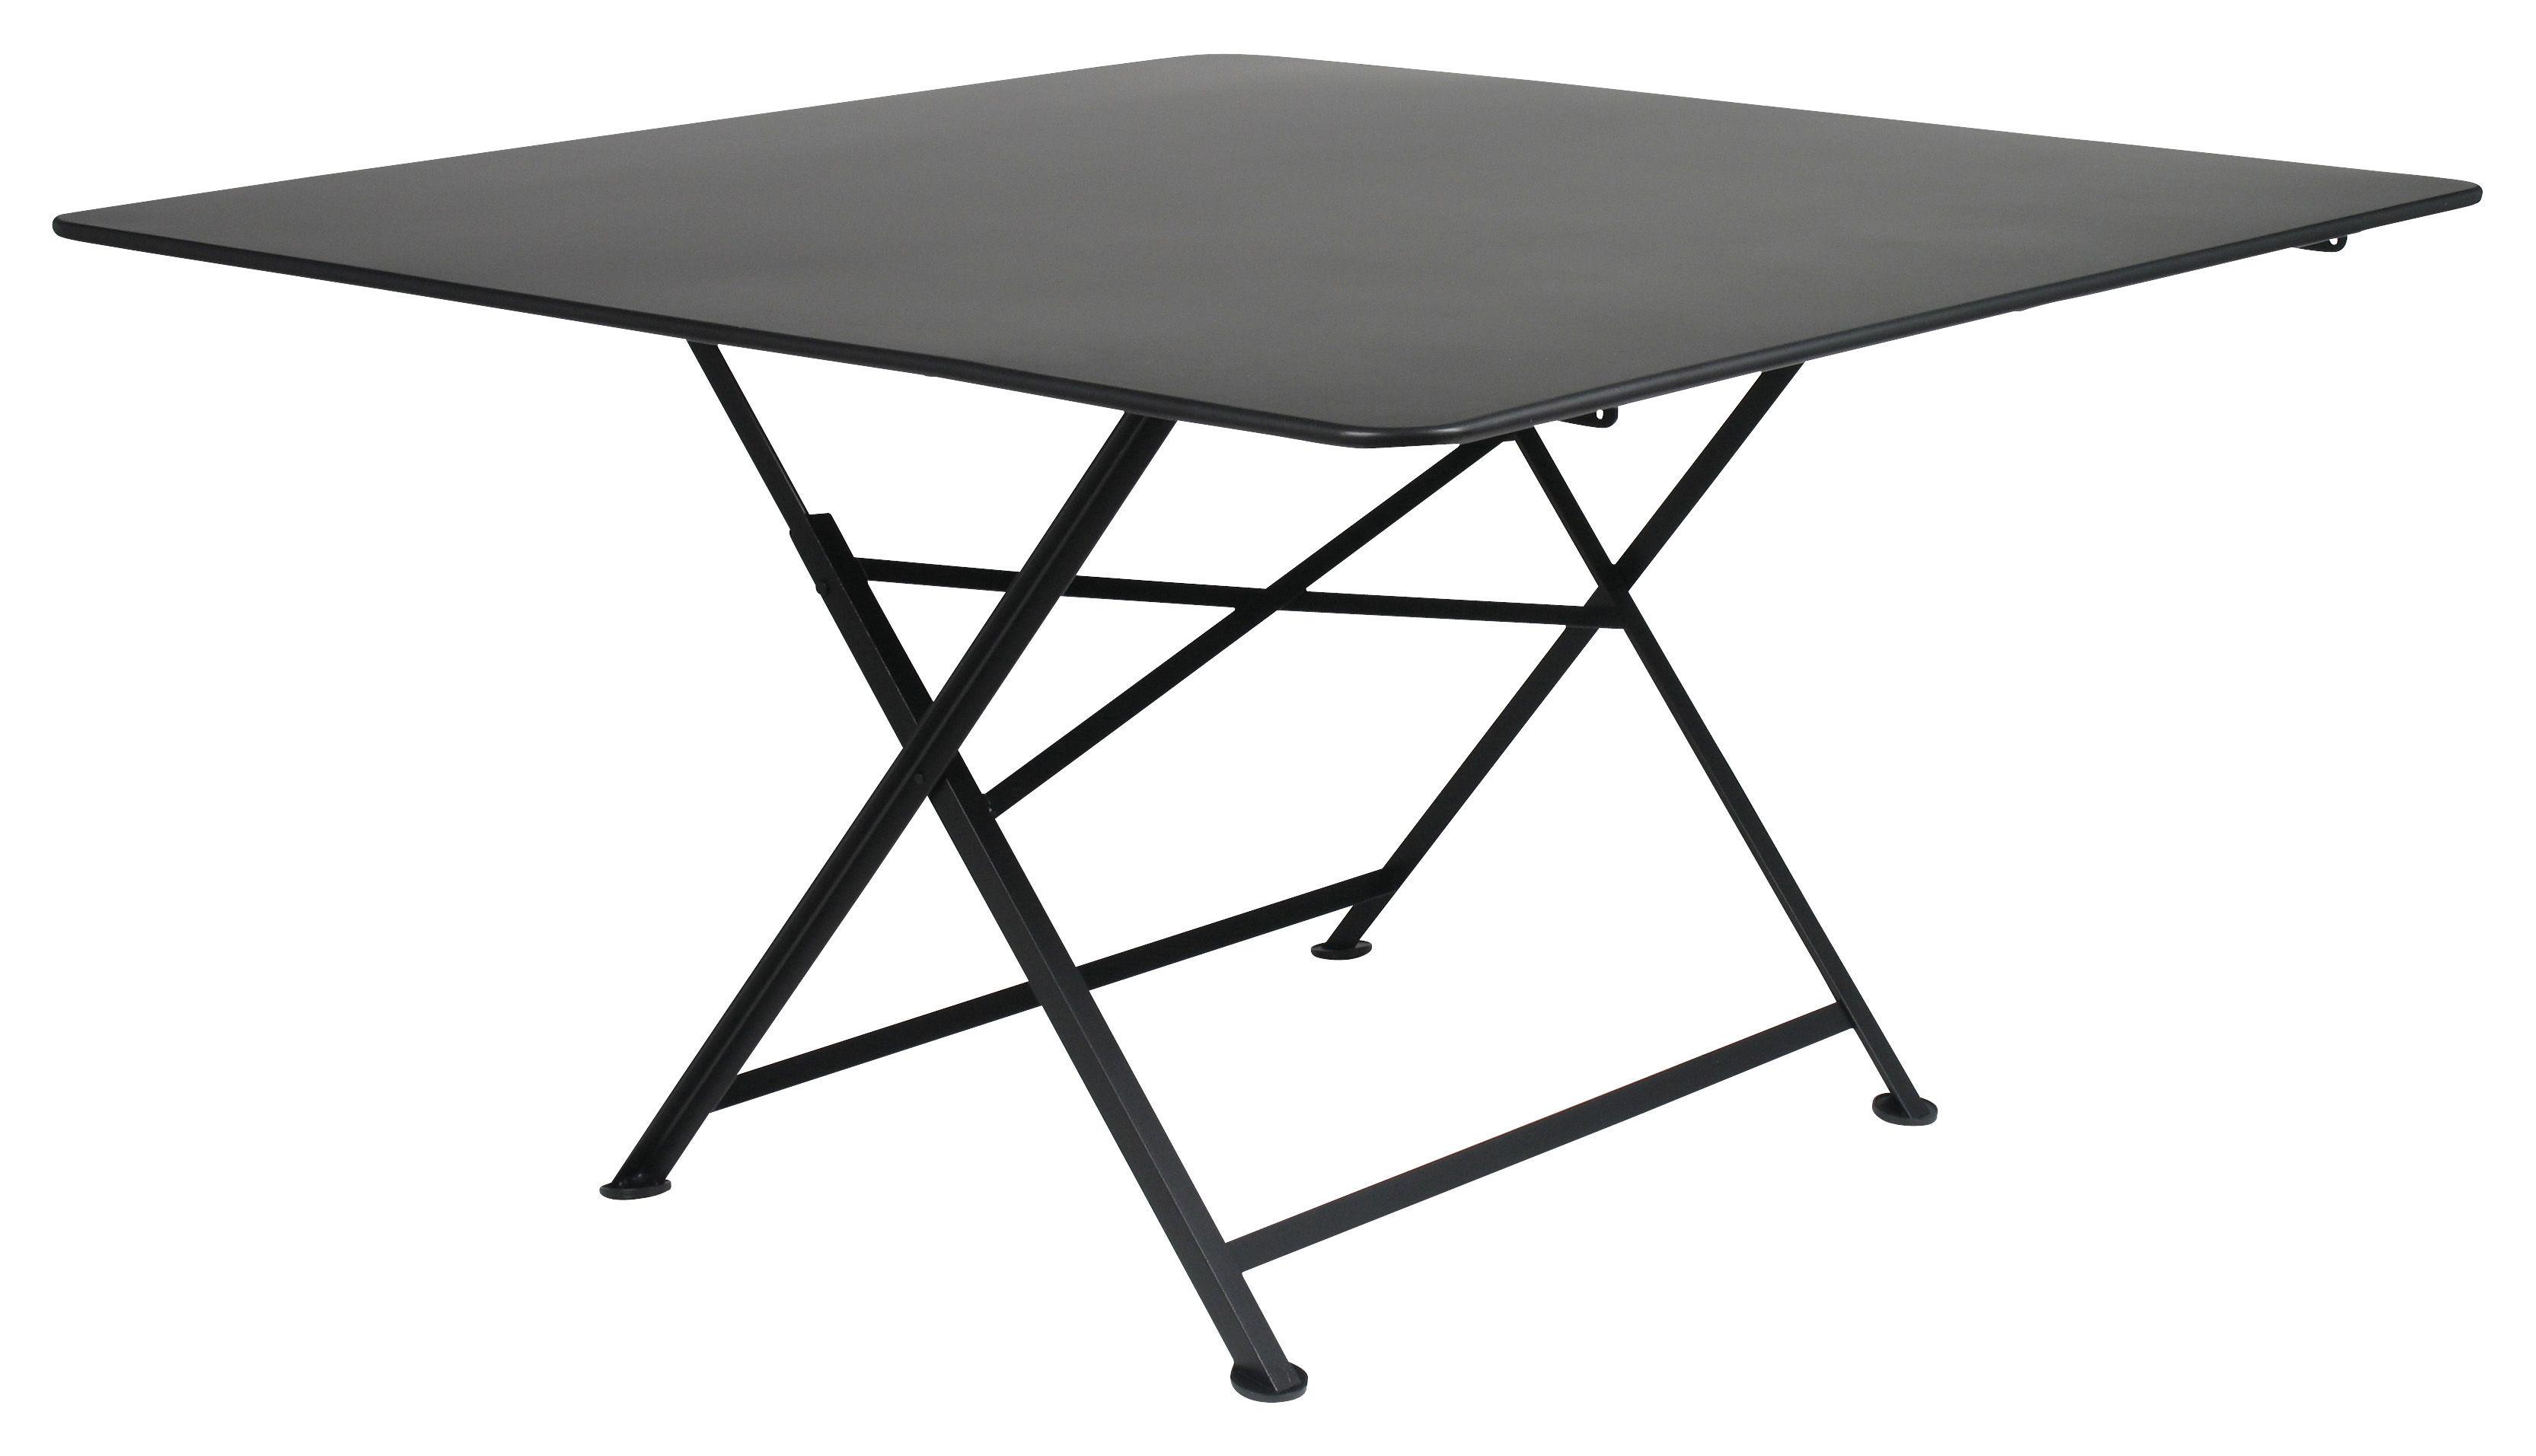 Table cargo pliante de fermob noire made in design - Table pliante design ...